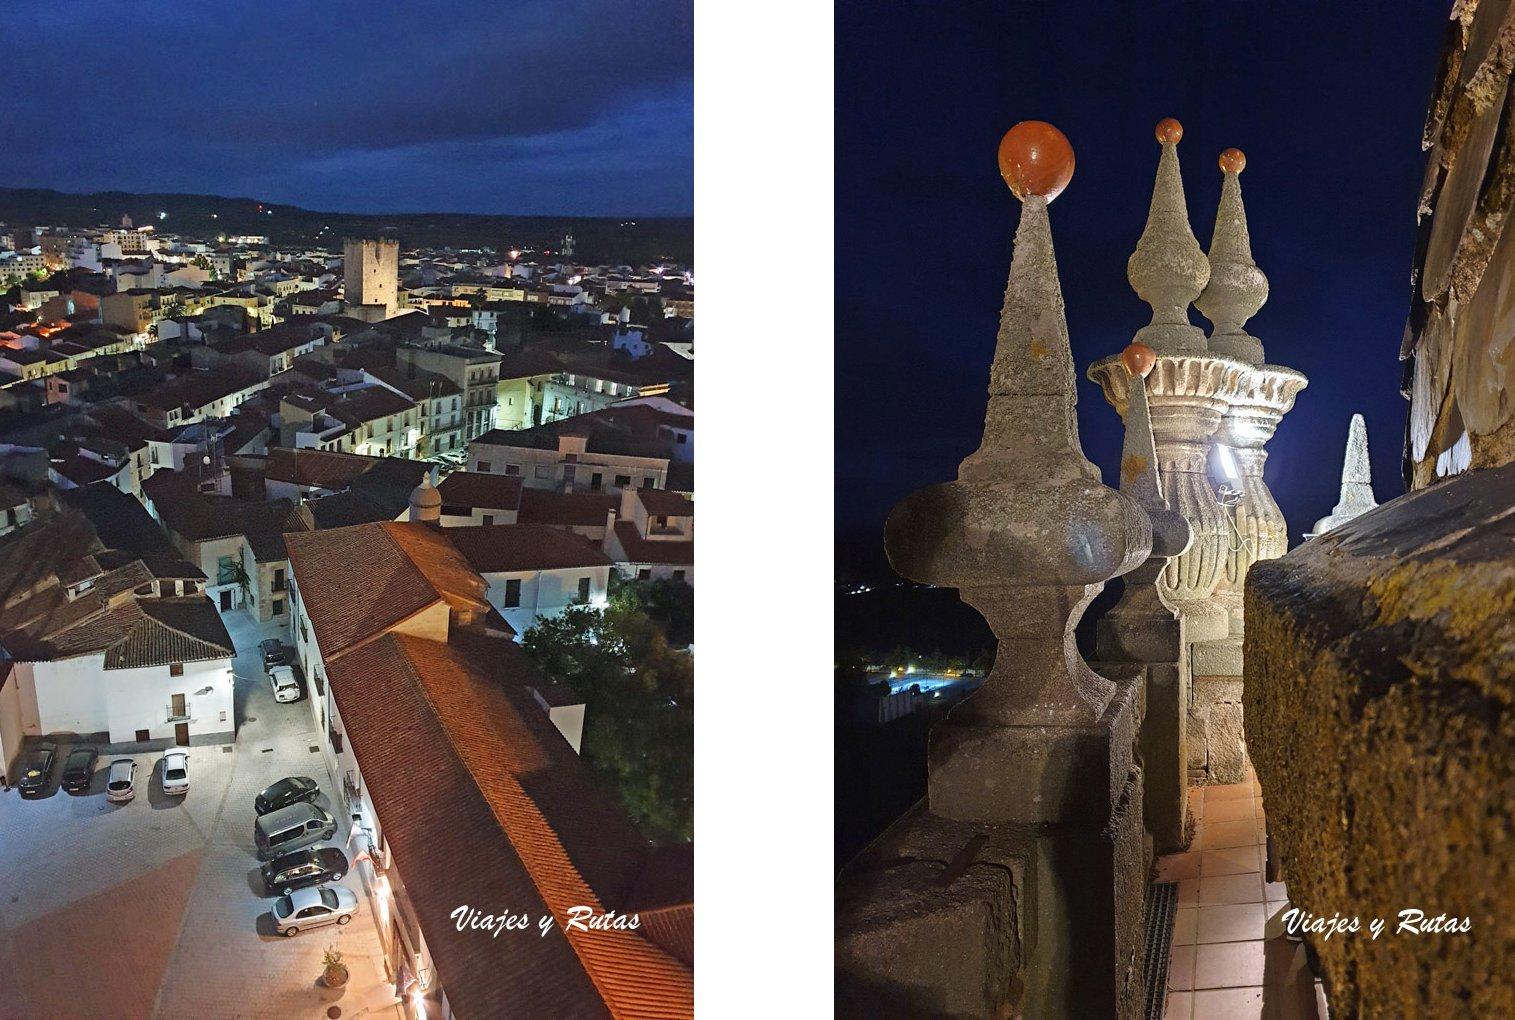 Torre de la Catedral de Coria